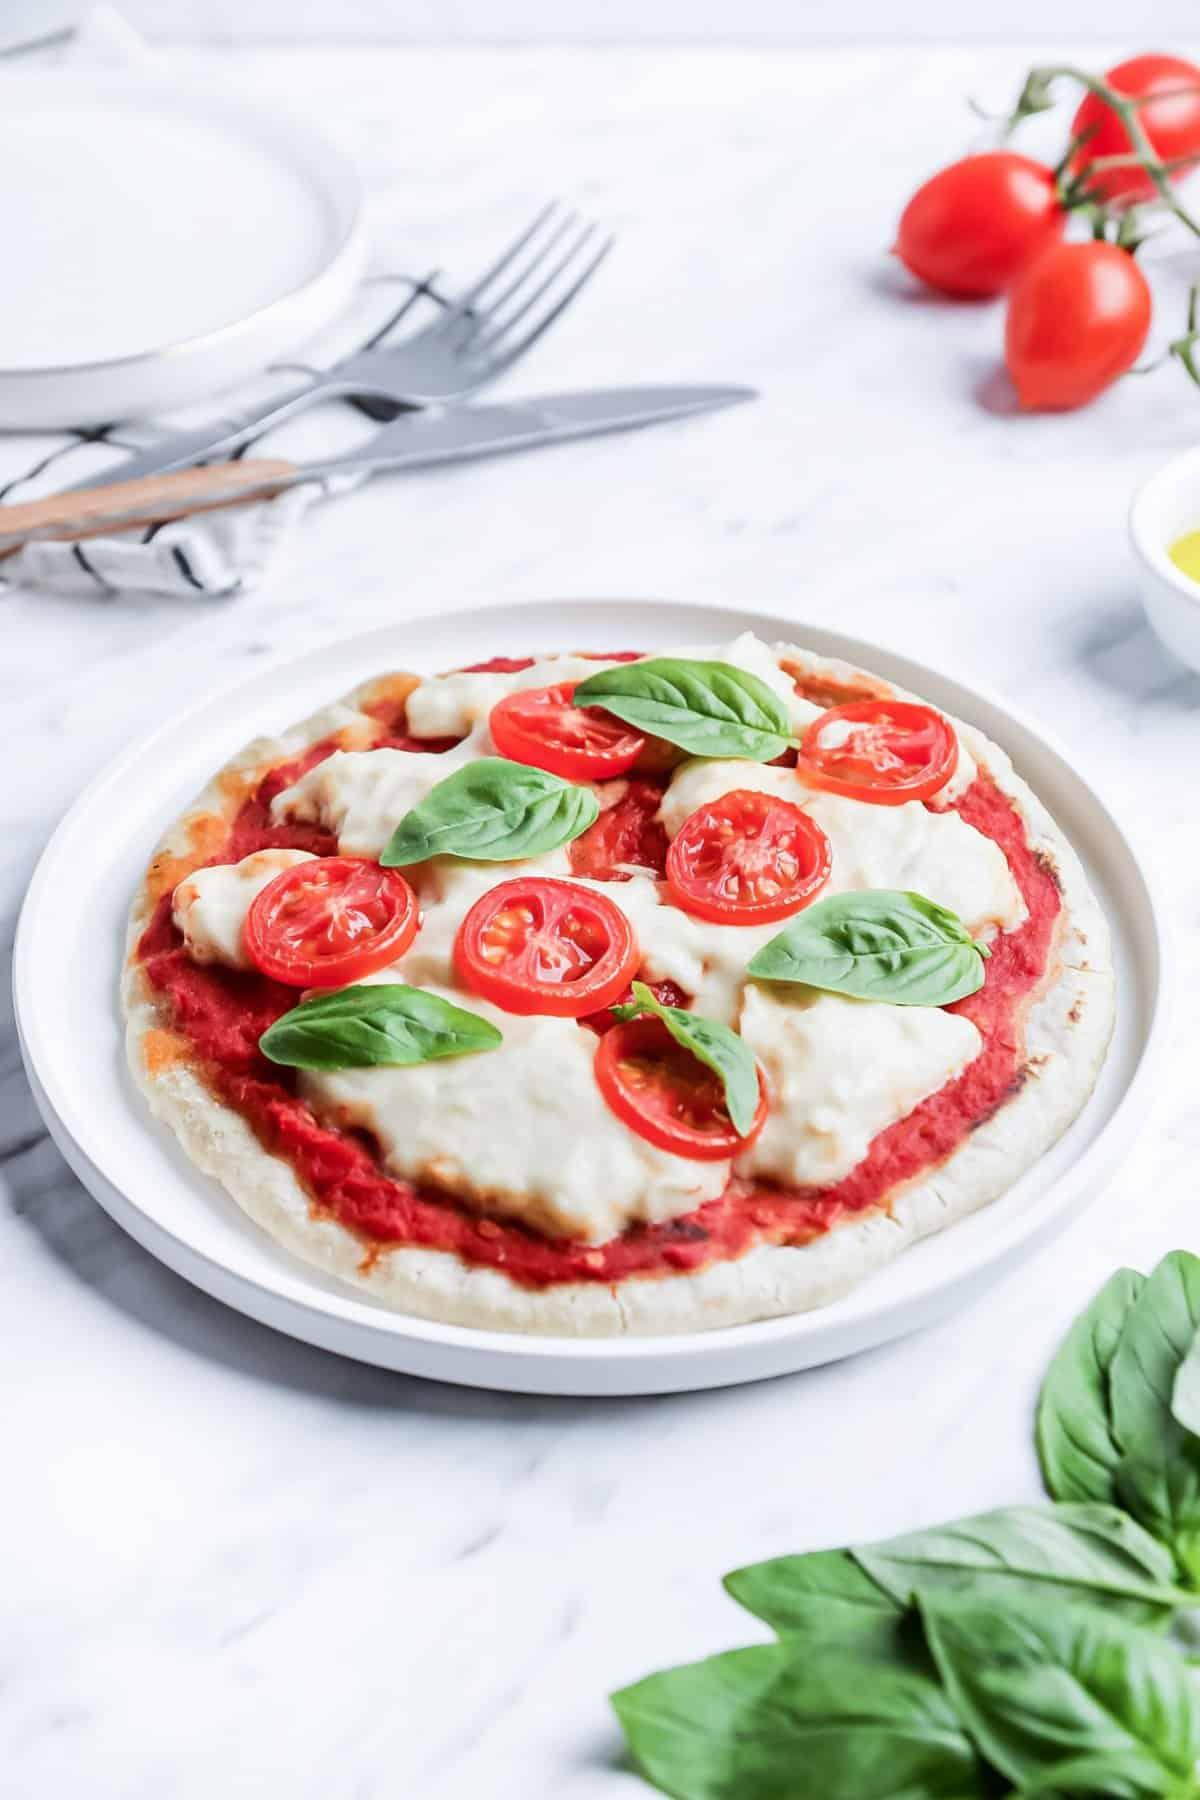 Homemade Vegan Pizza Crust